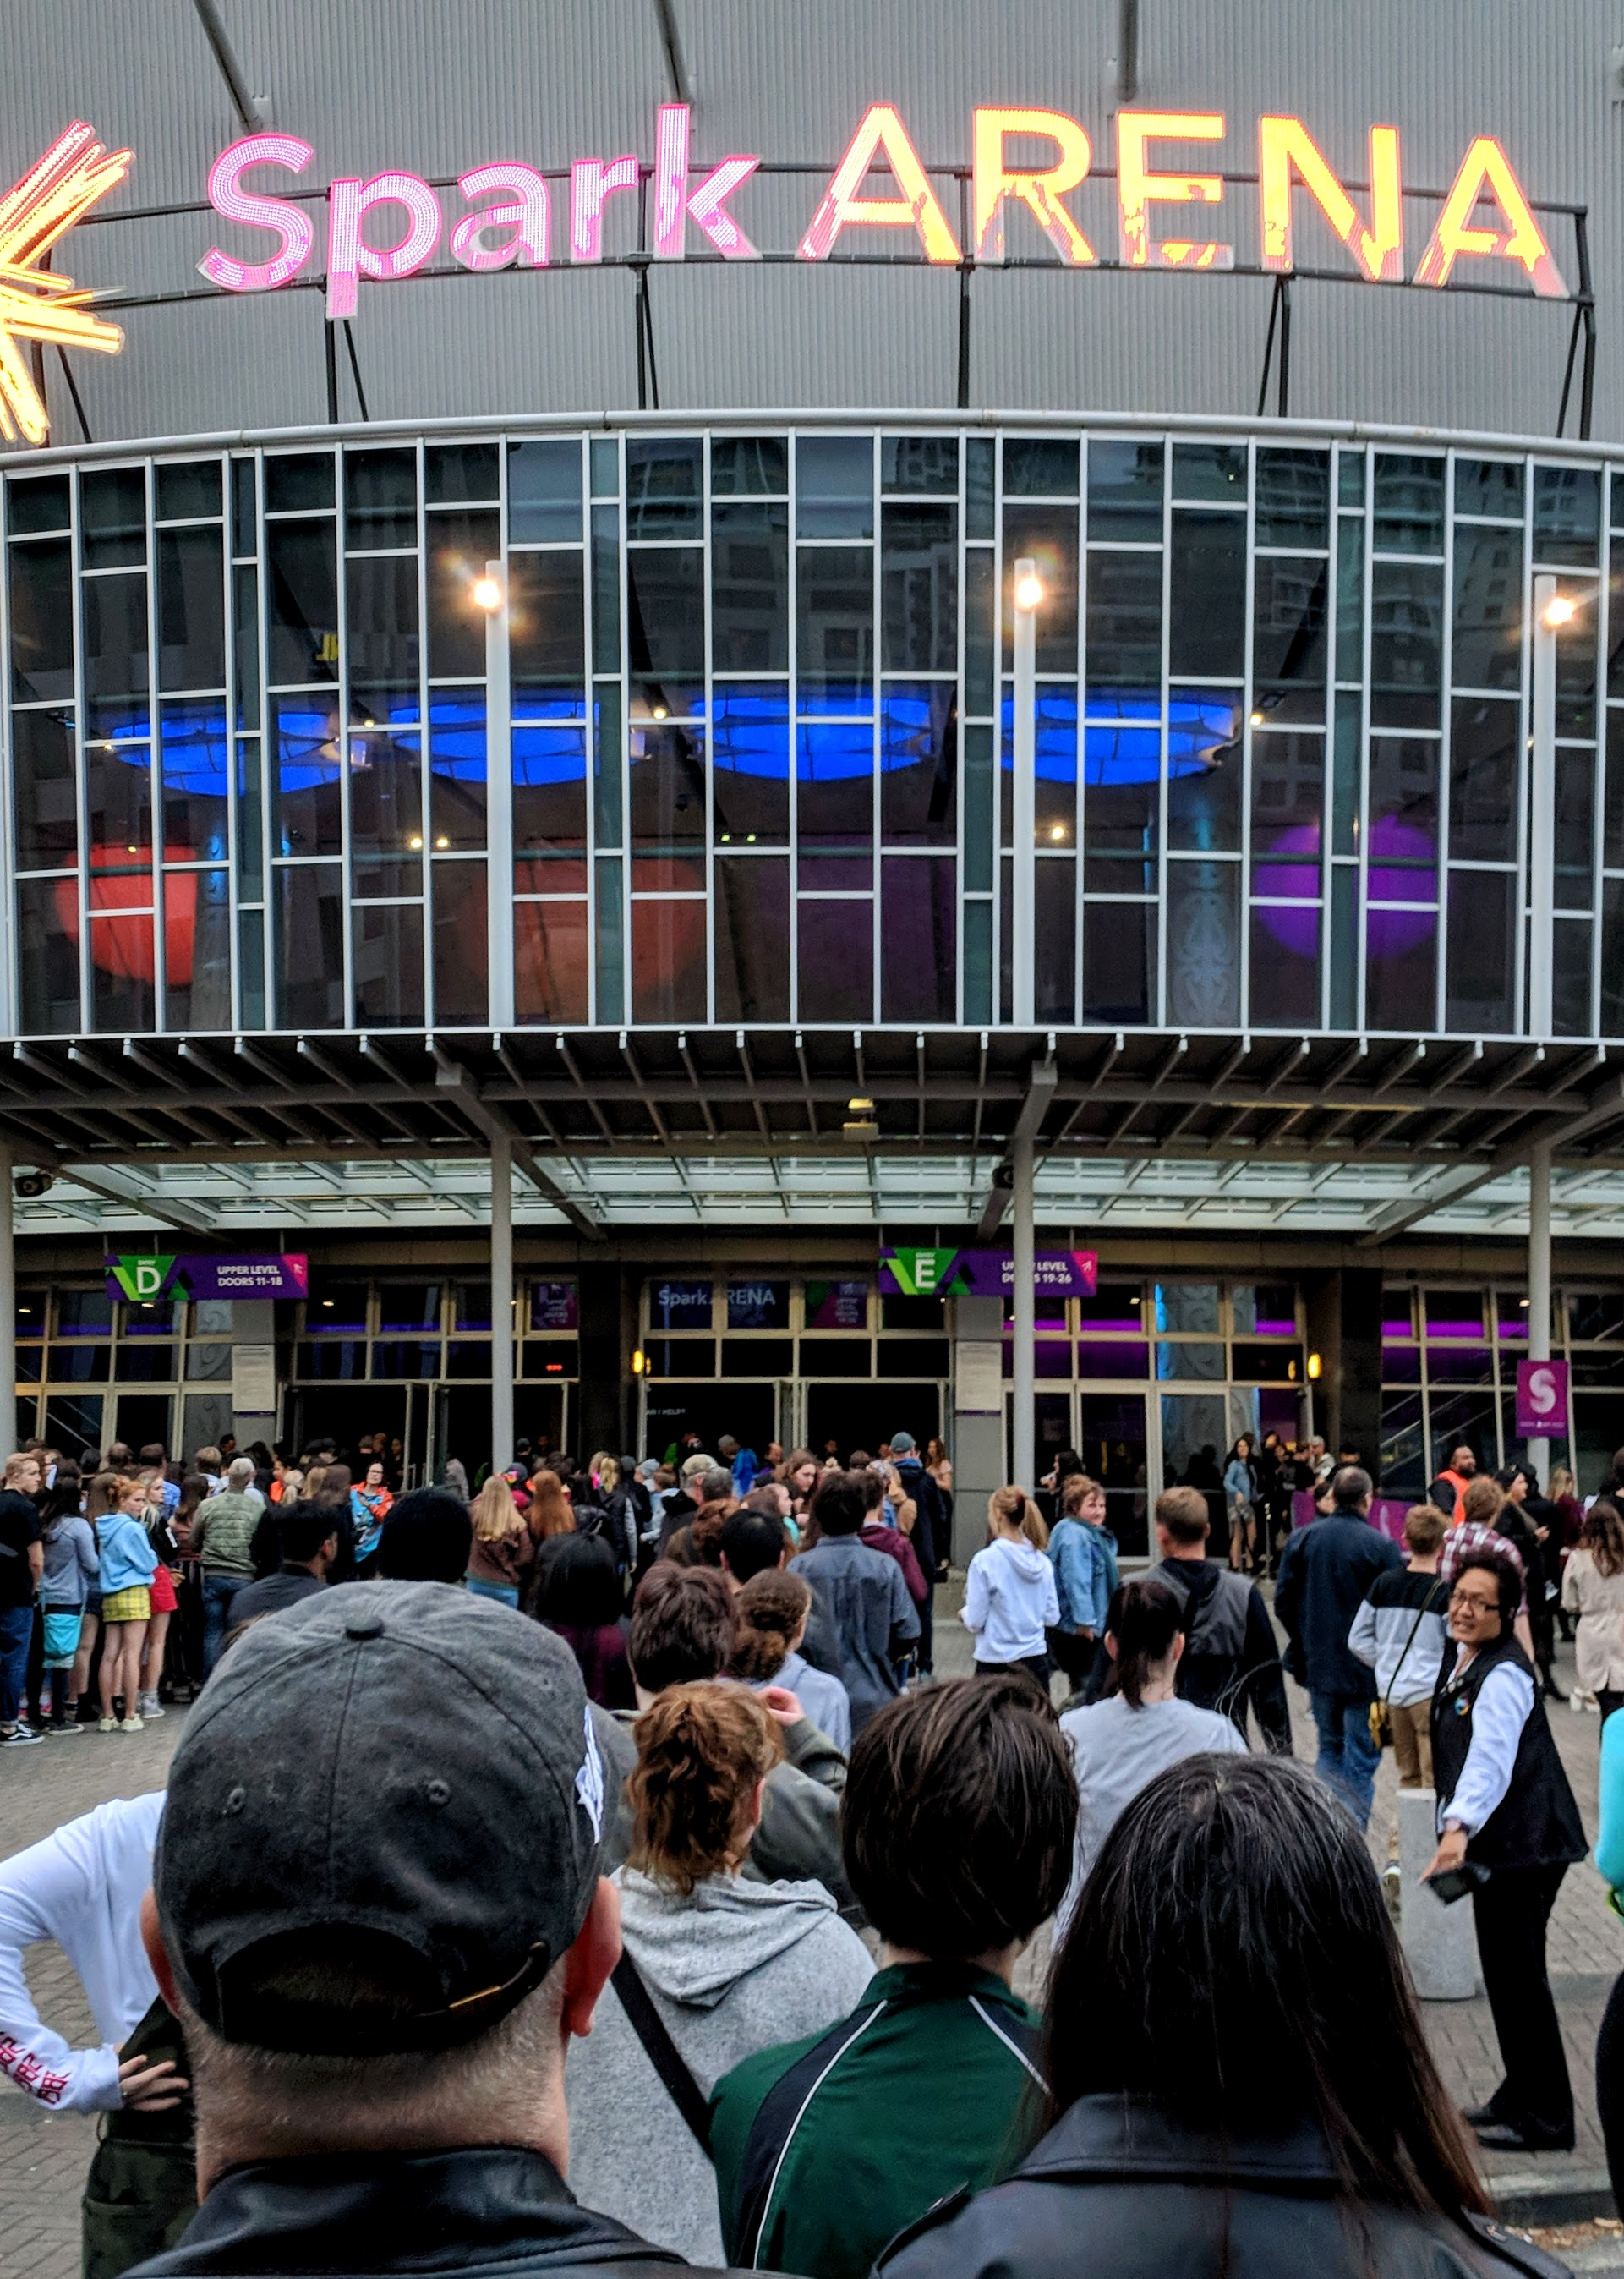 Spark Arena with a queue